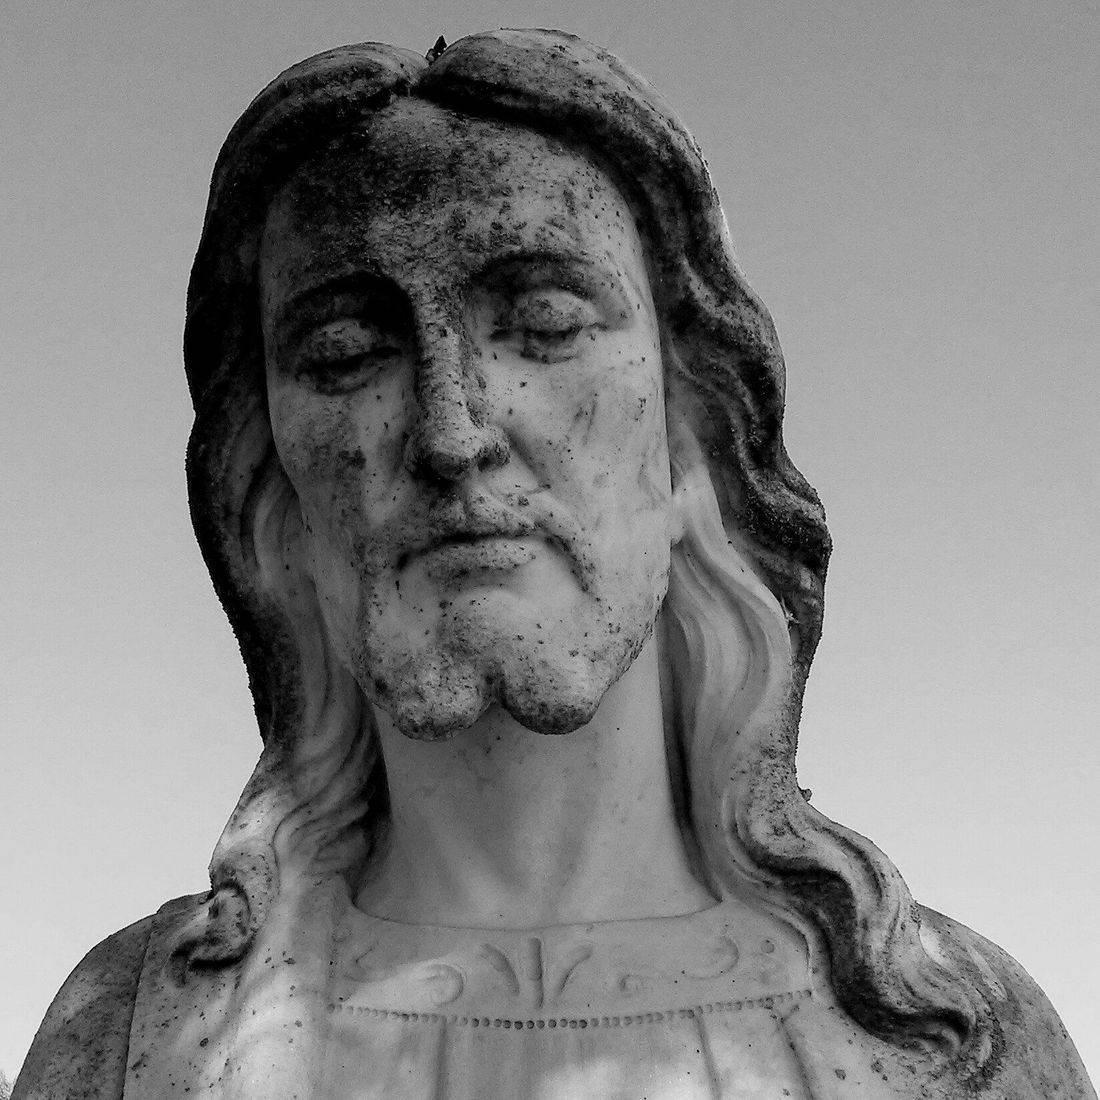 Cemetery, Religion, Statue, Jesus, God